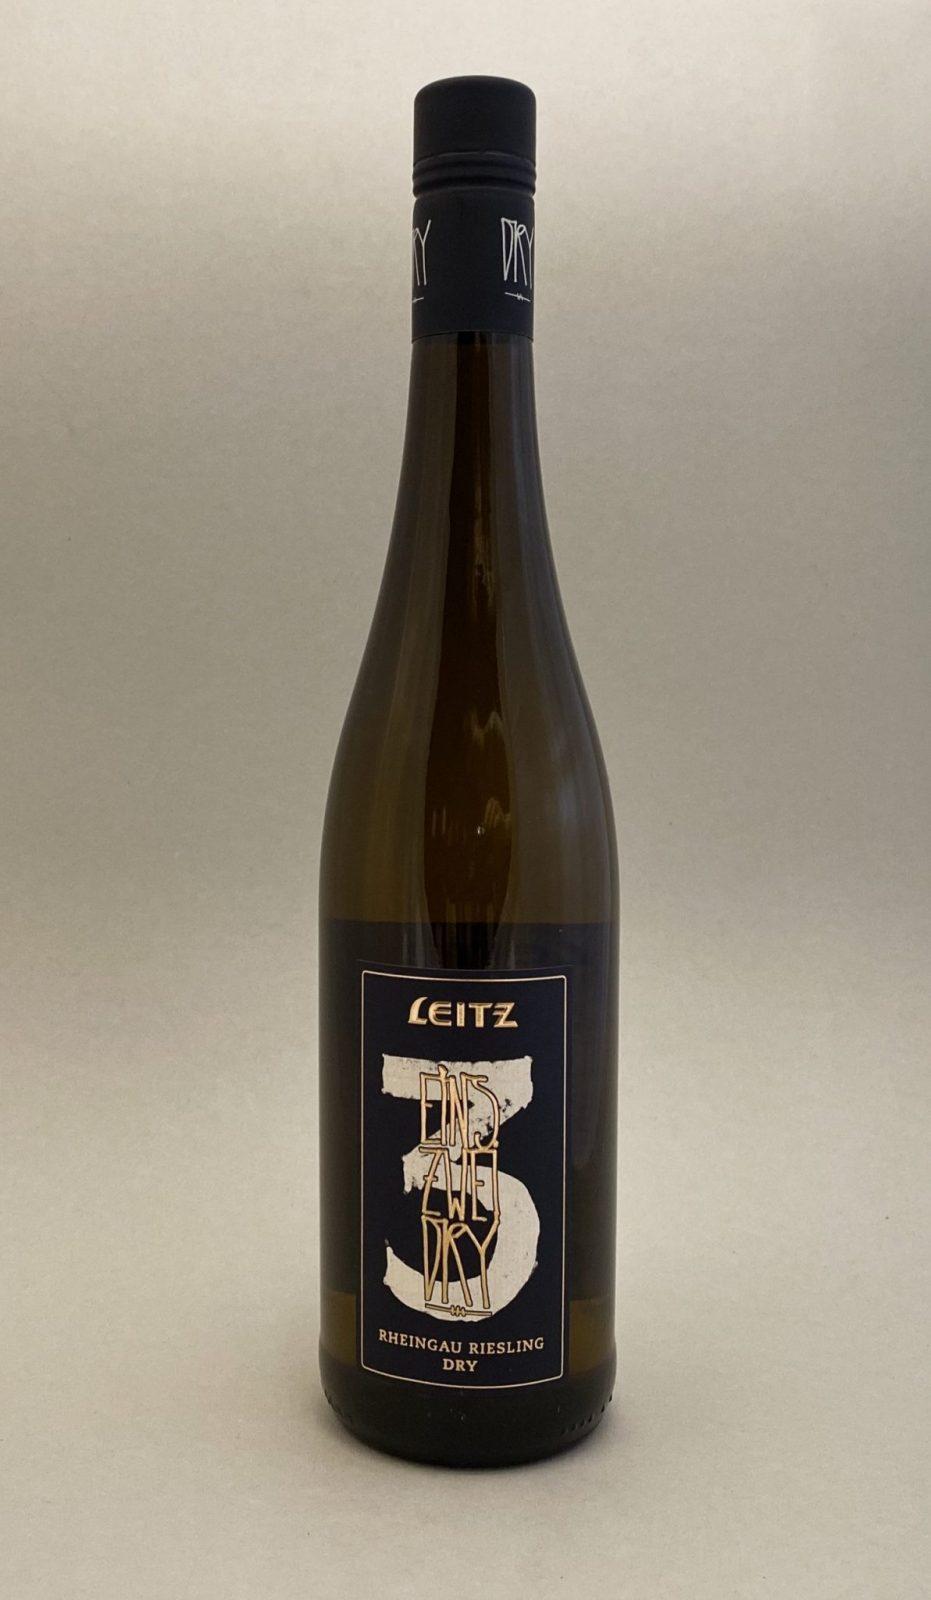 LEITZ 123 Riesling, vinoteka Bratislava Sunny wines slnecnice mesto, petrzalka, vino biele z Nemecka